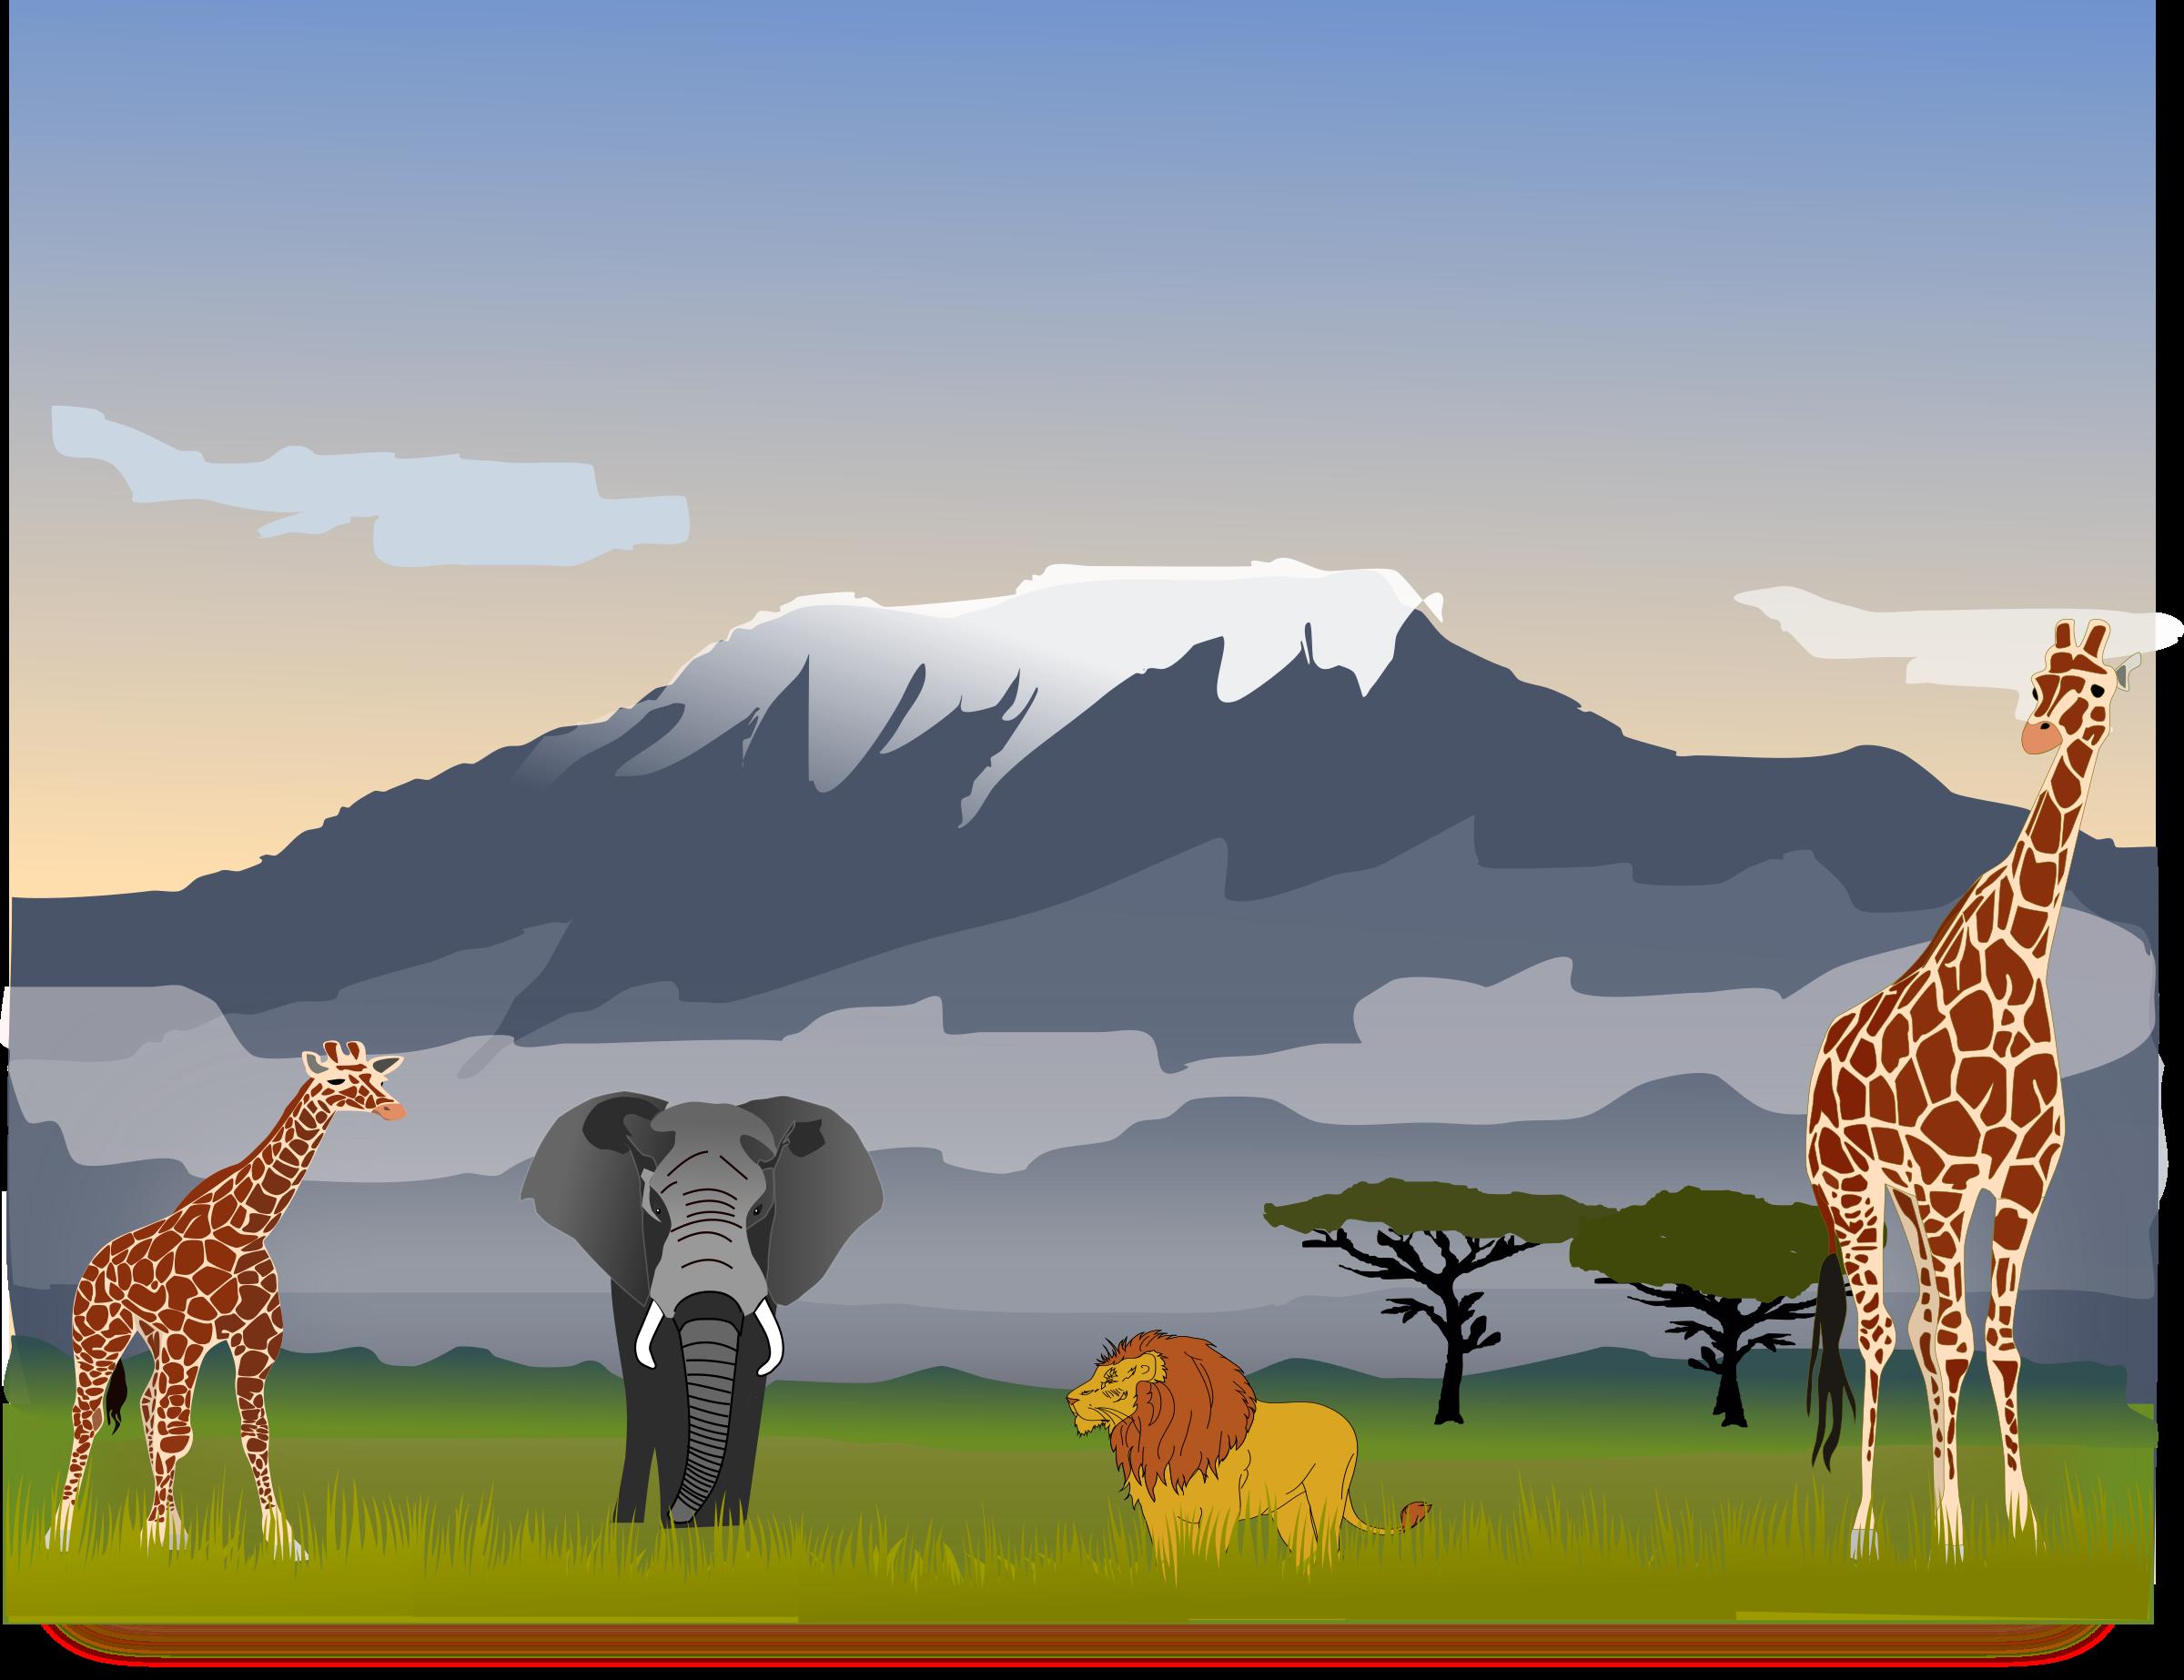 Tanzania clipart #4, Download drawings